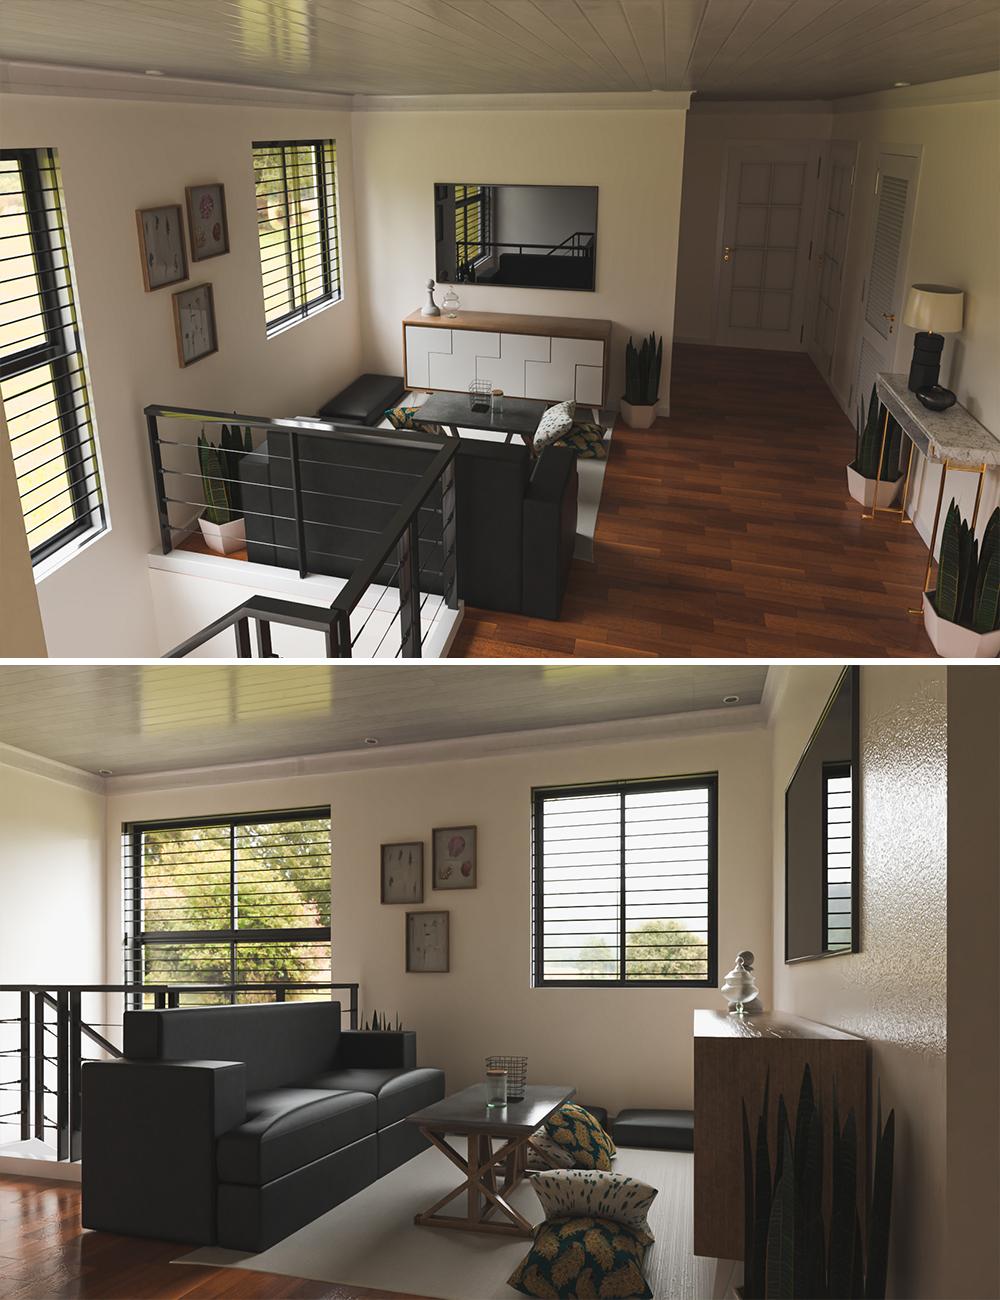 Avil Family Room by: Tesla3dCorp, 3D Models by Daz 3D